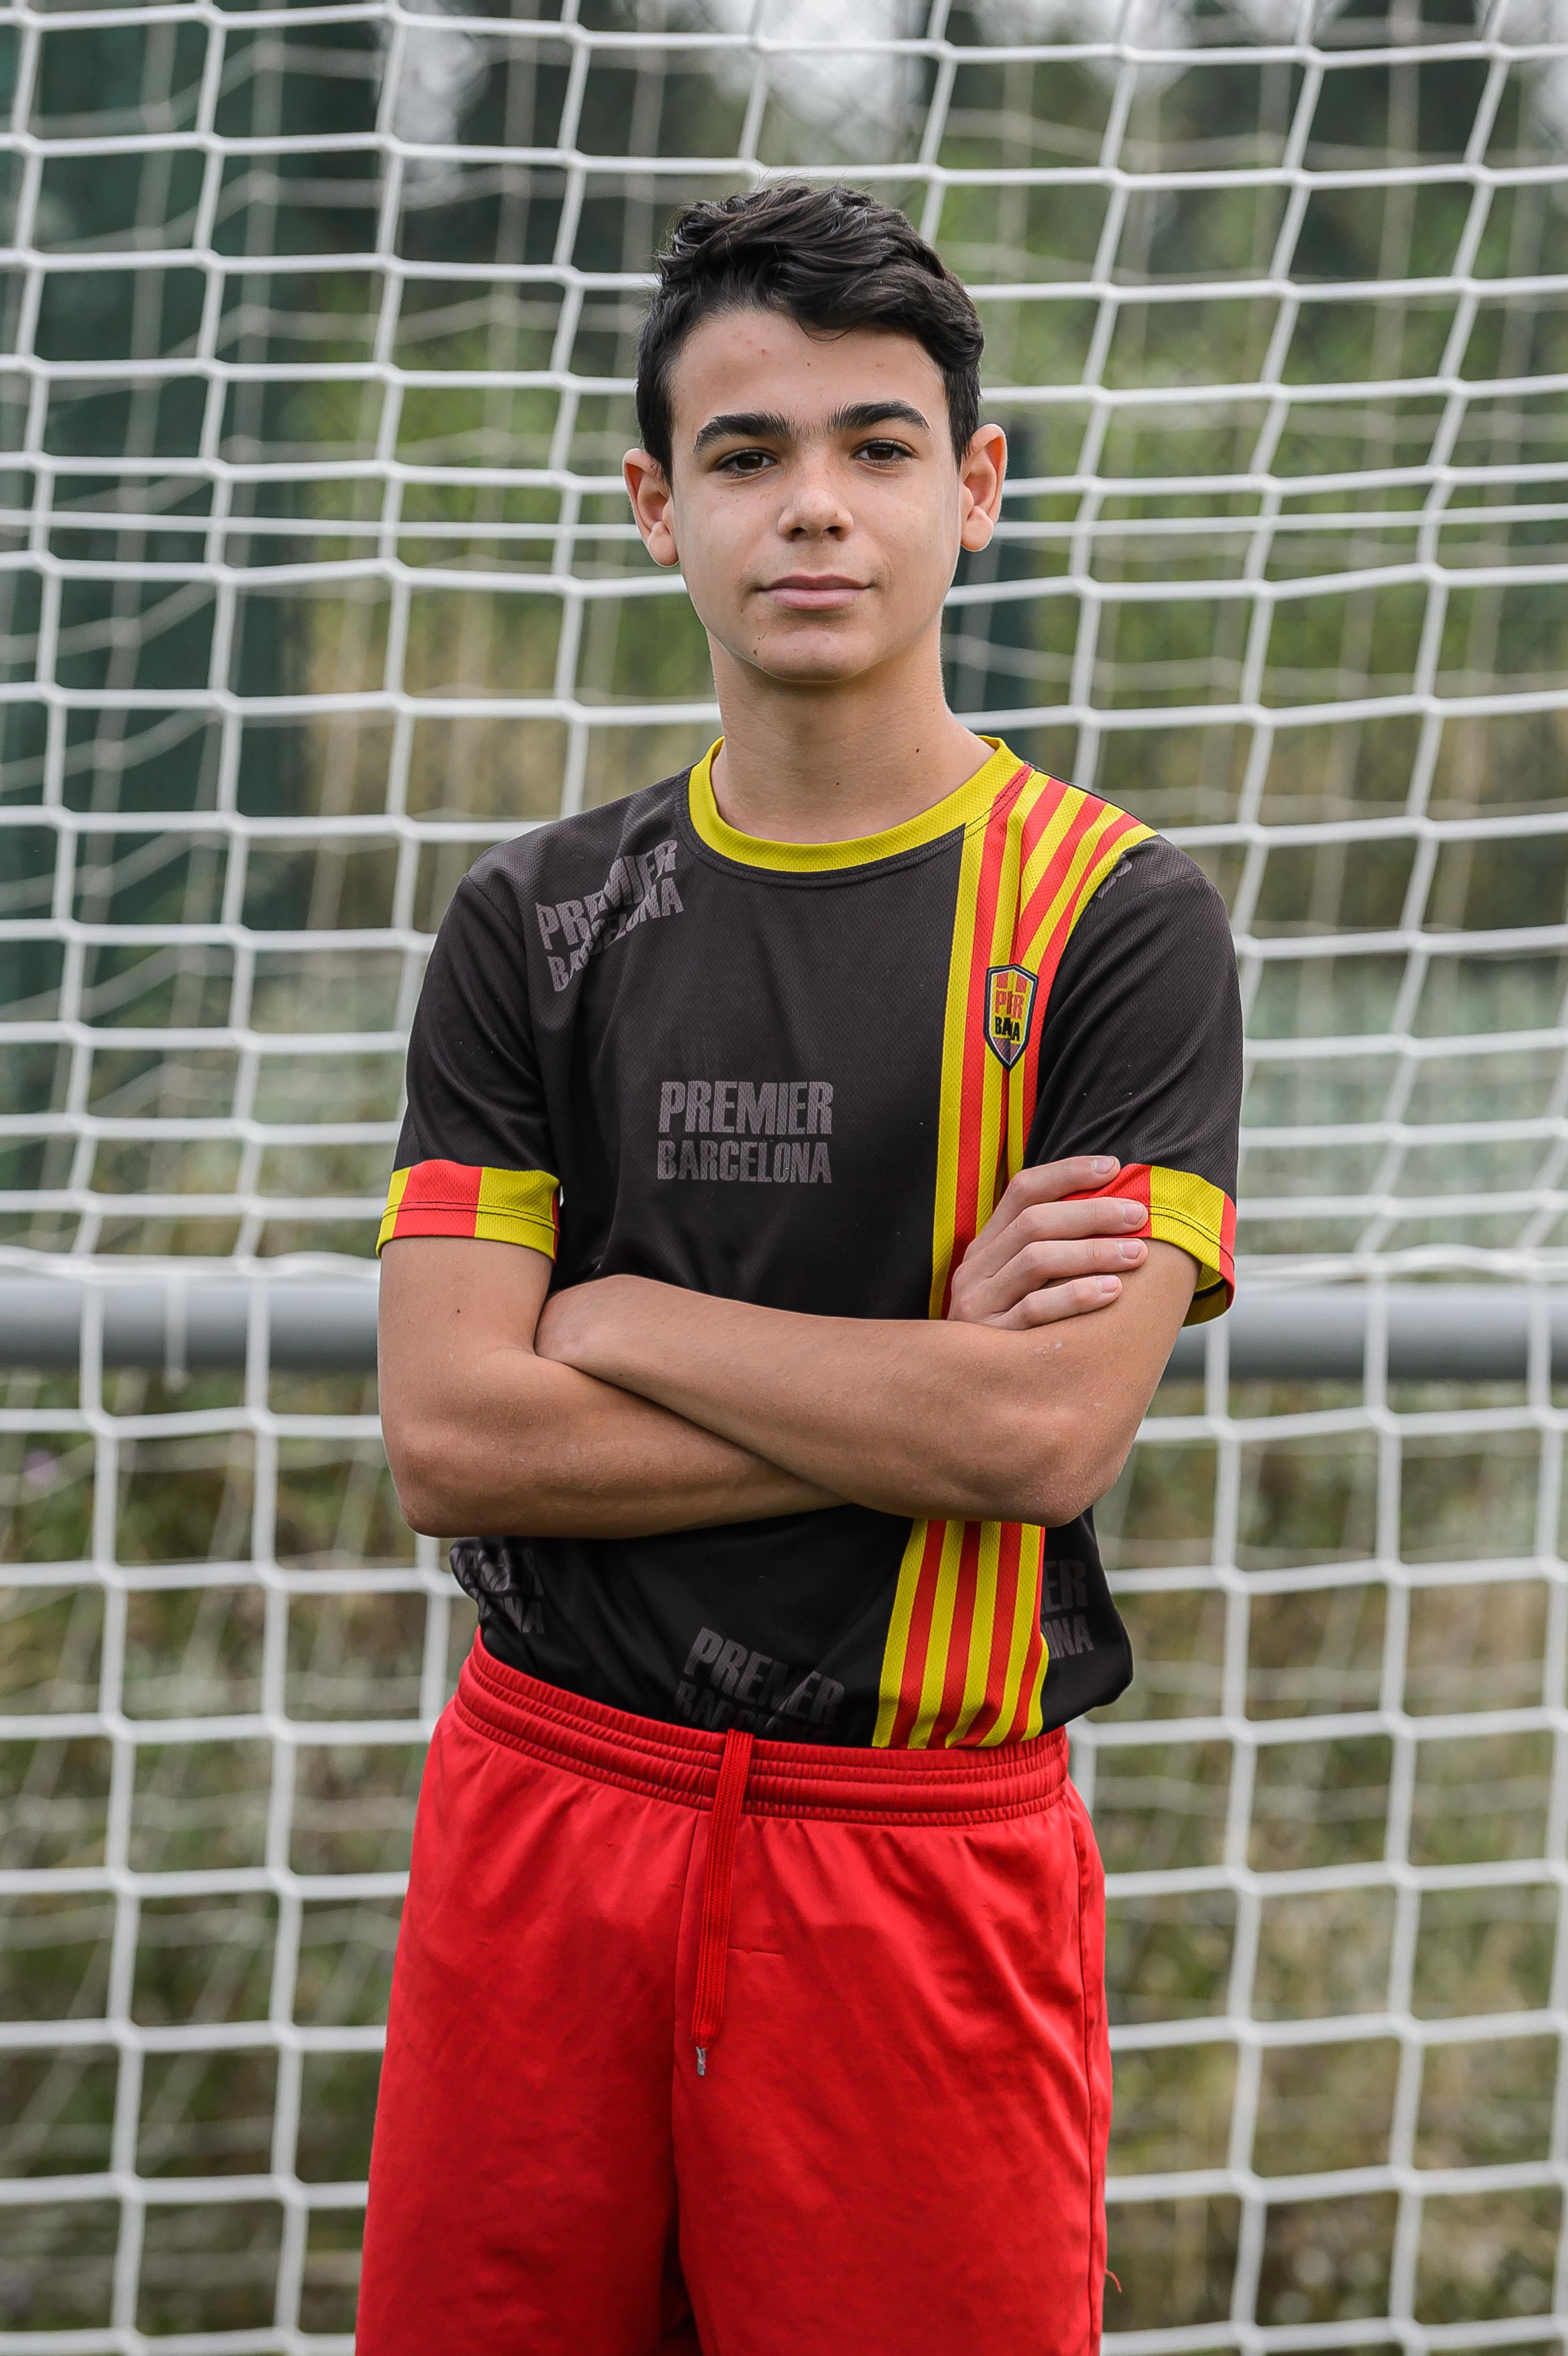 KILIAN PEREZ